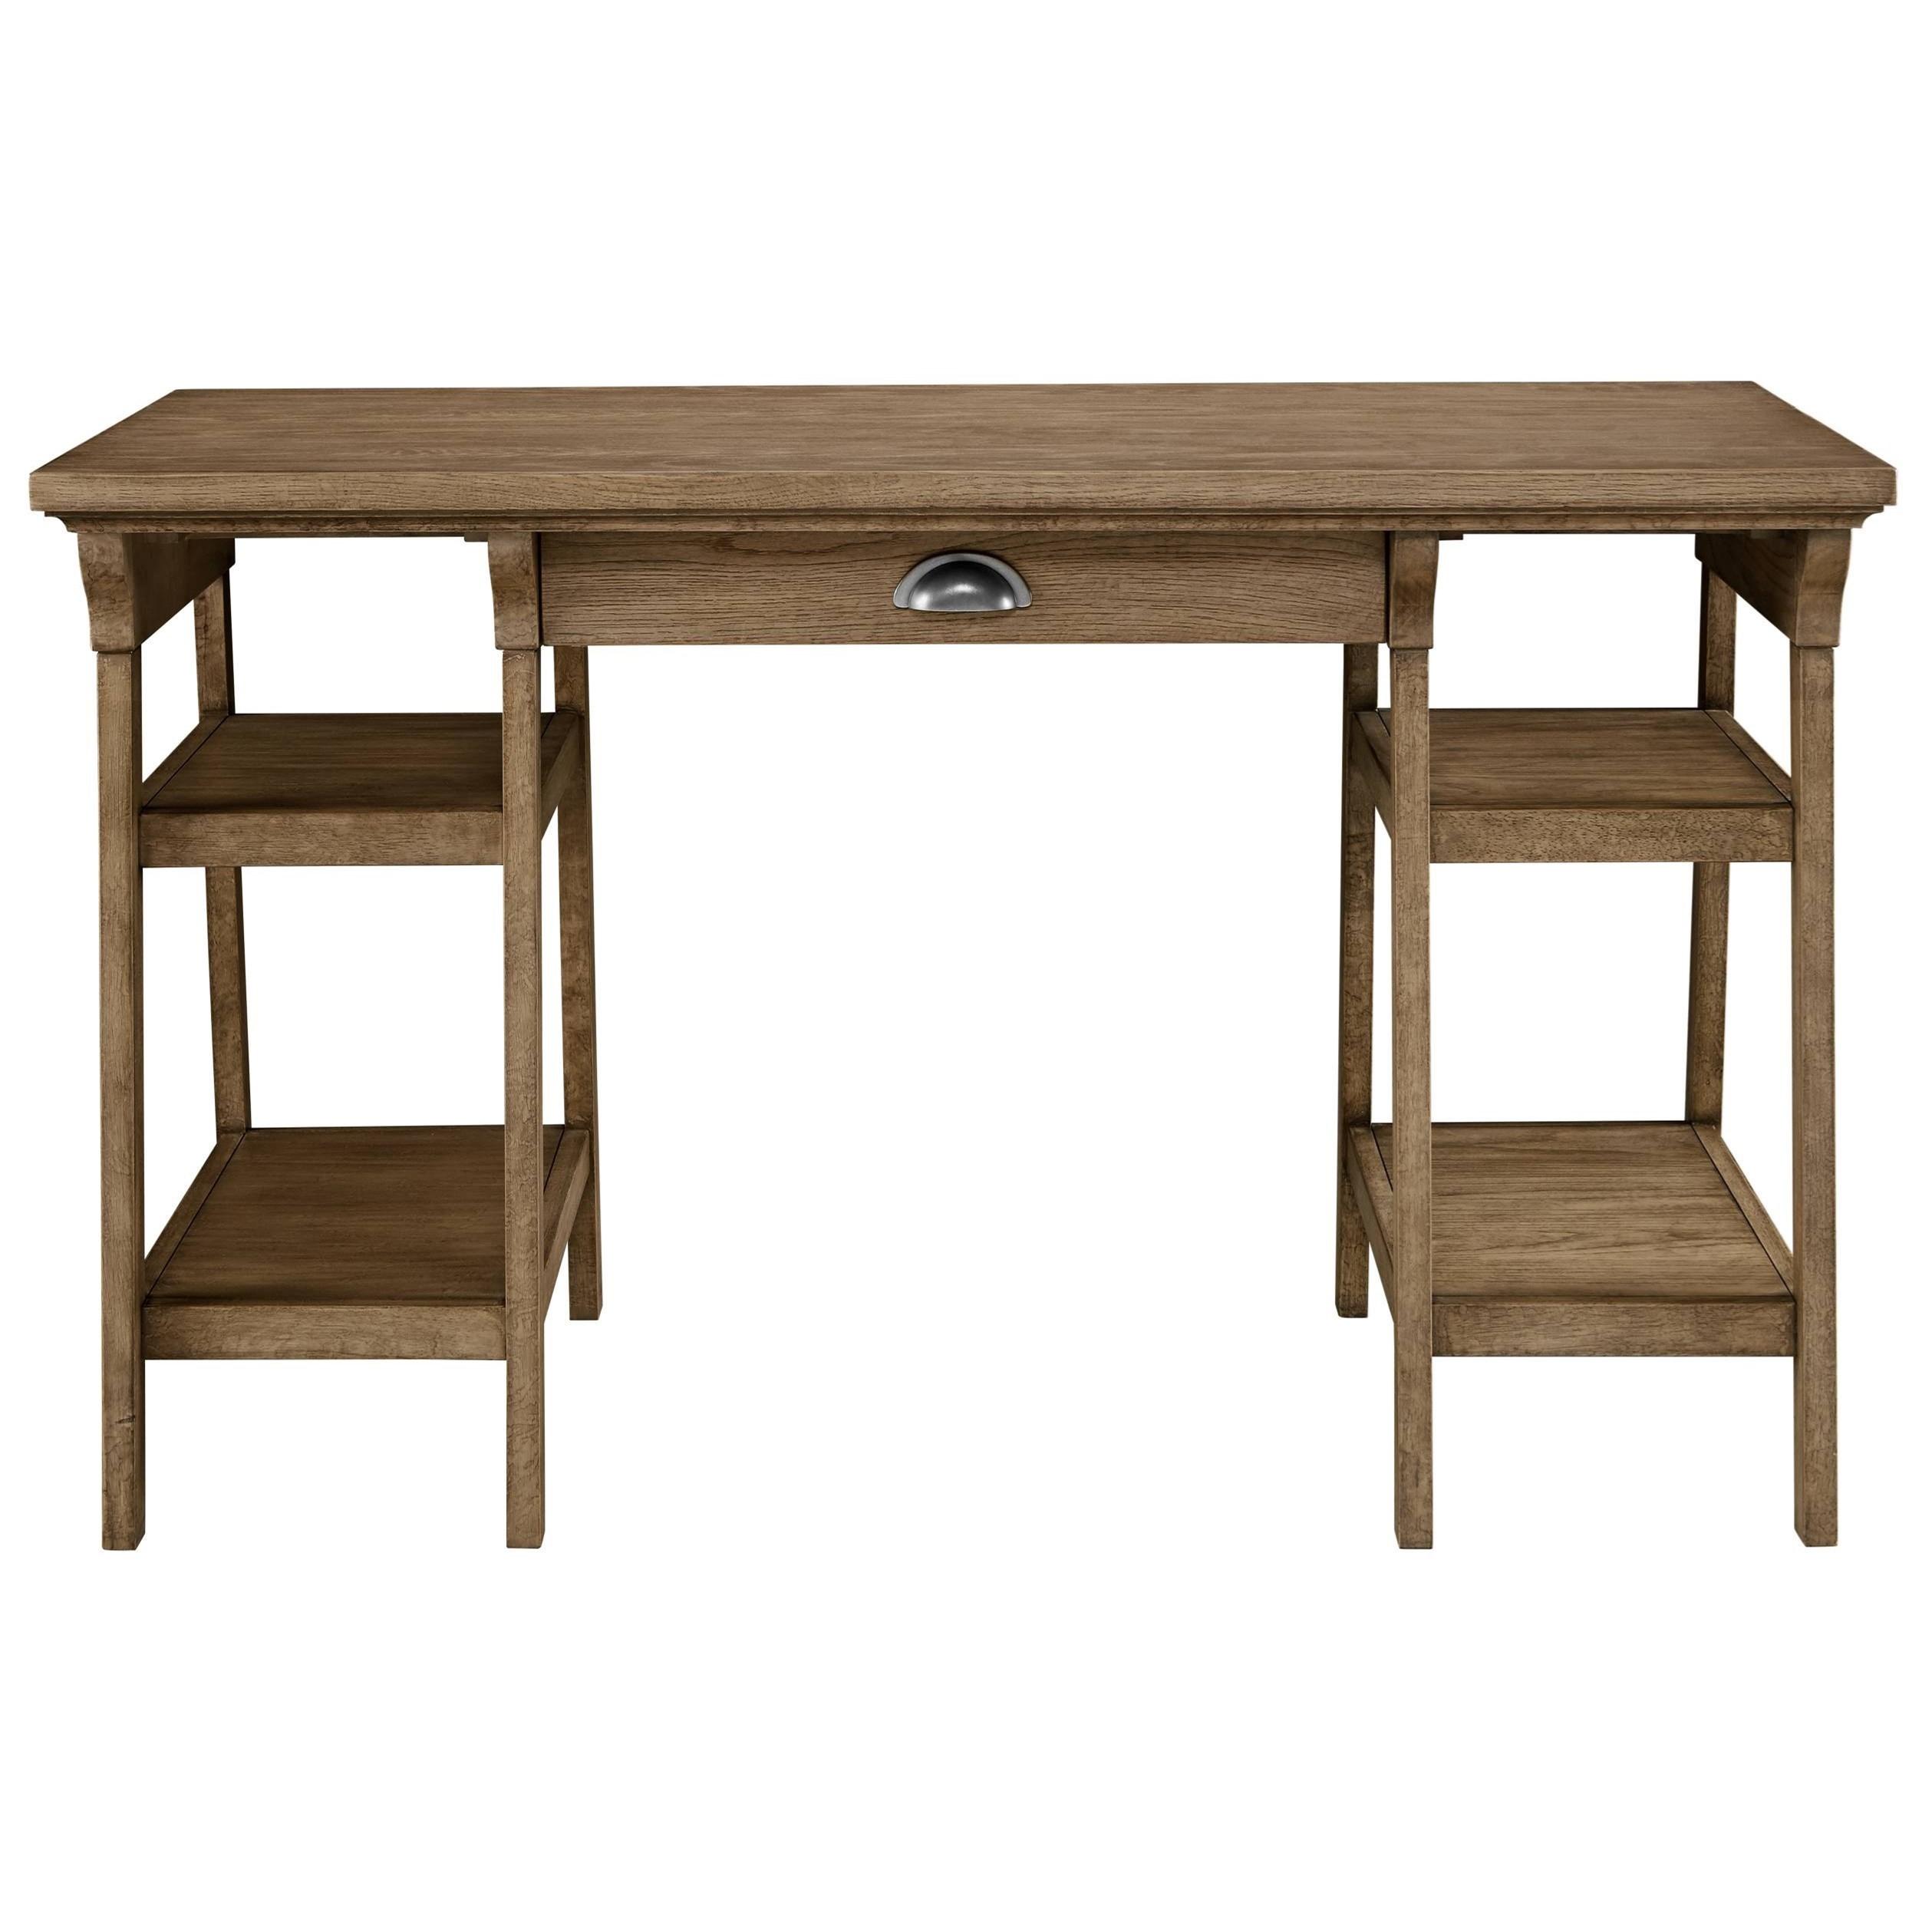 Stone & Leigh Furniture Driftwood Park Desk - Item Number: 536-13-27